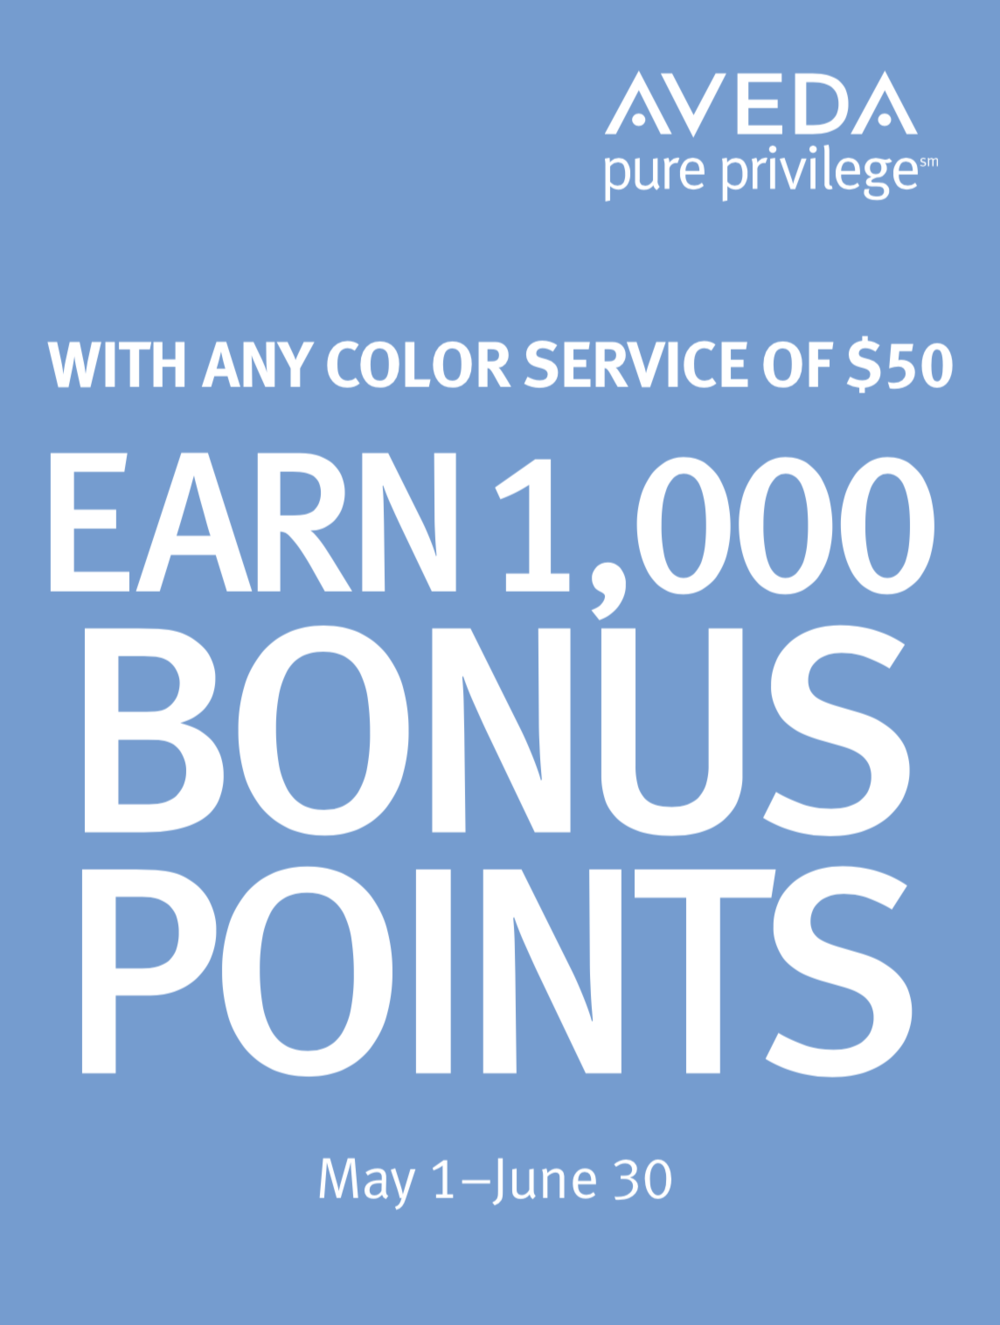 pure-privilege-may1-june30.png